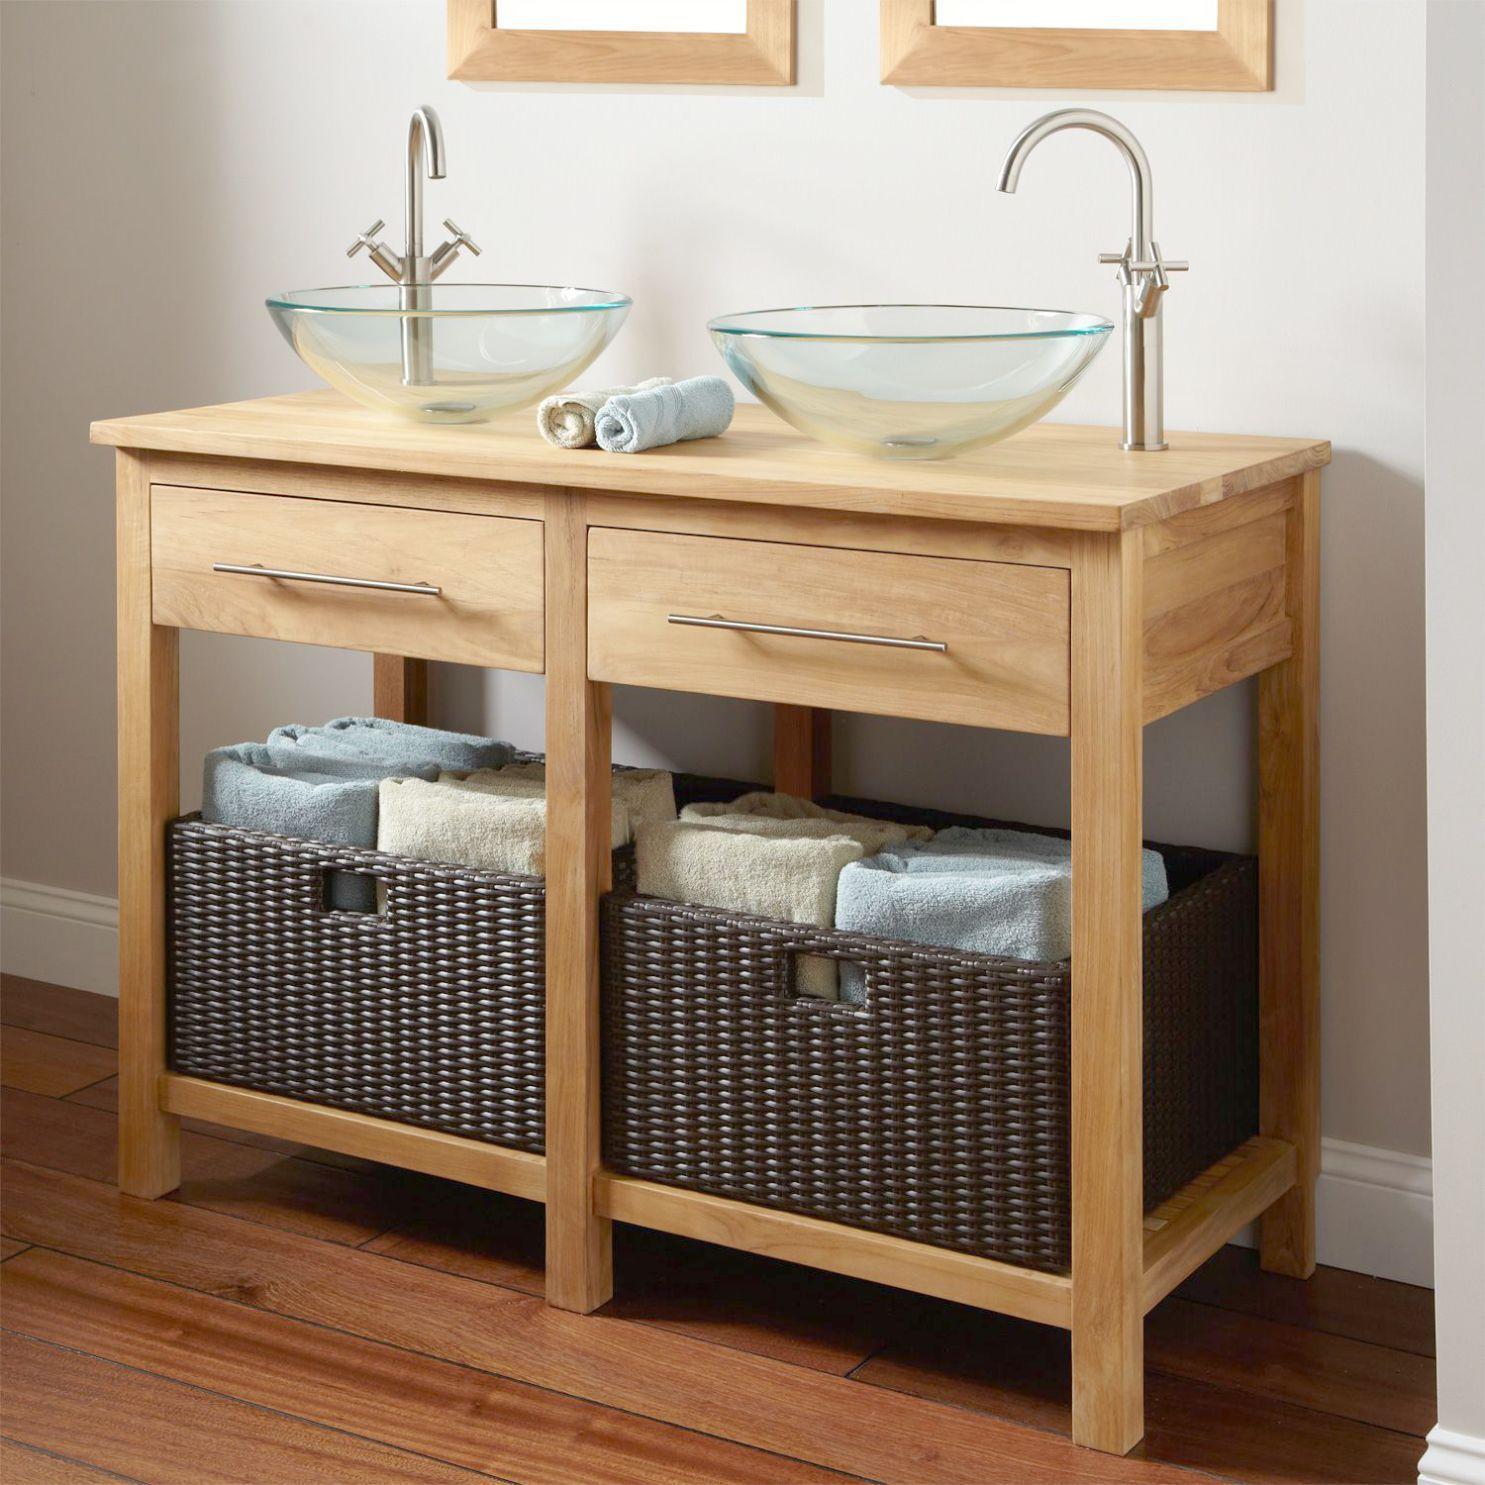 Bathroom Cabinets Gloss White Whenever Rustic Bathroom Designs On A Budget Diy Bathroom Vanity Small Bathroom Vanities Rustic Bathroom Vanities